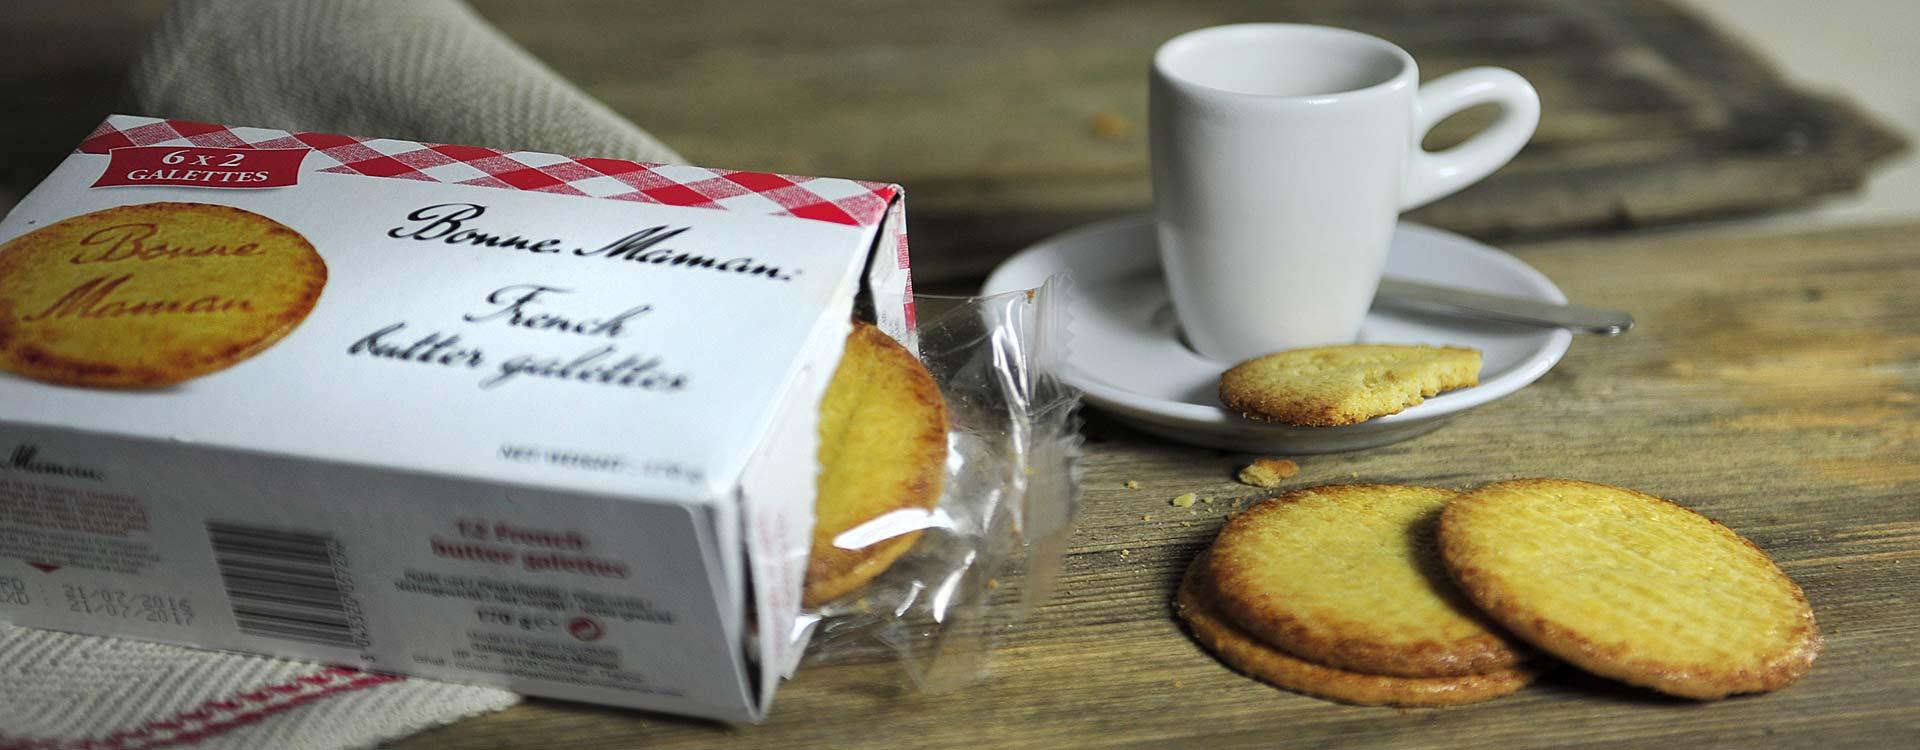 Top Food Feinkost - Bonne Maman Caramel